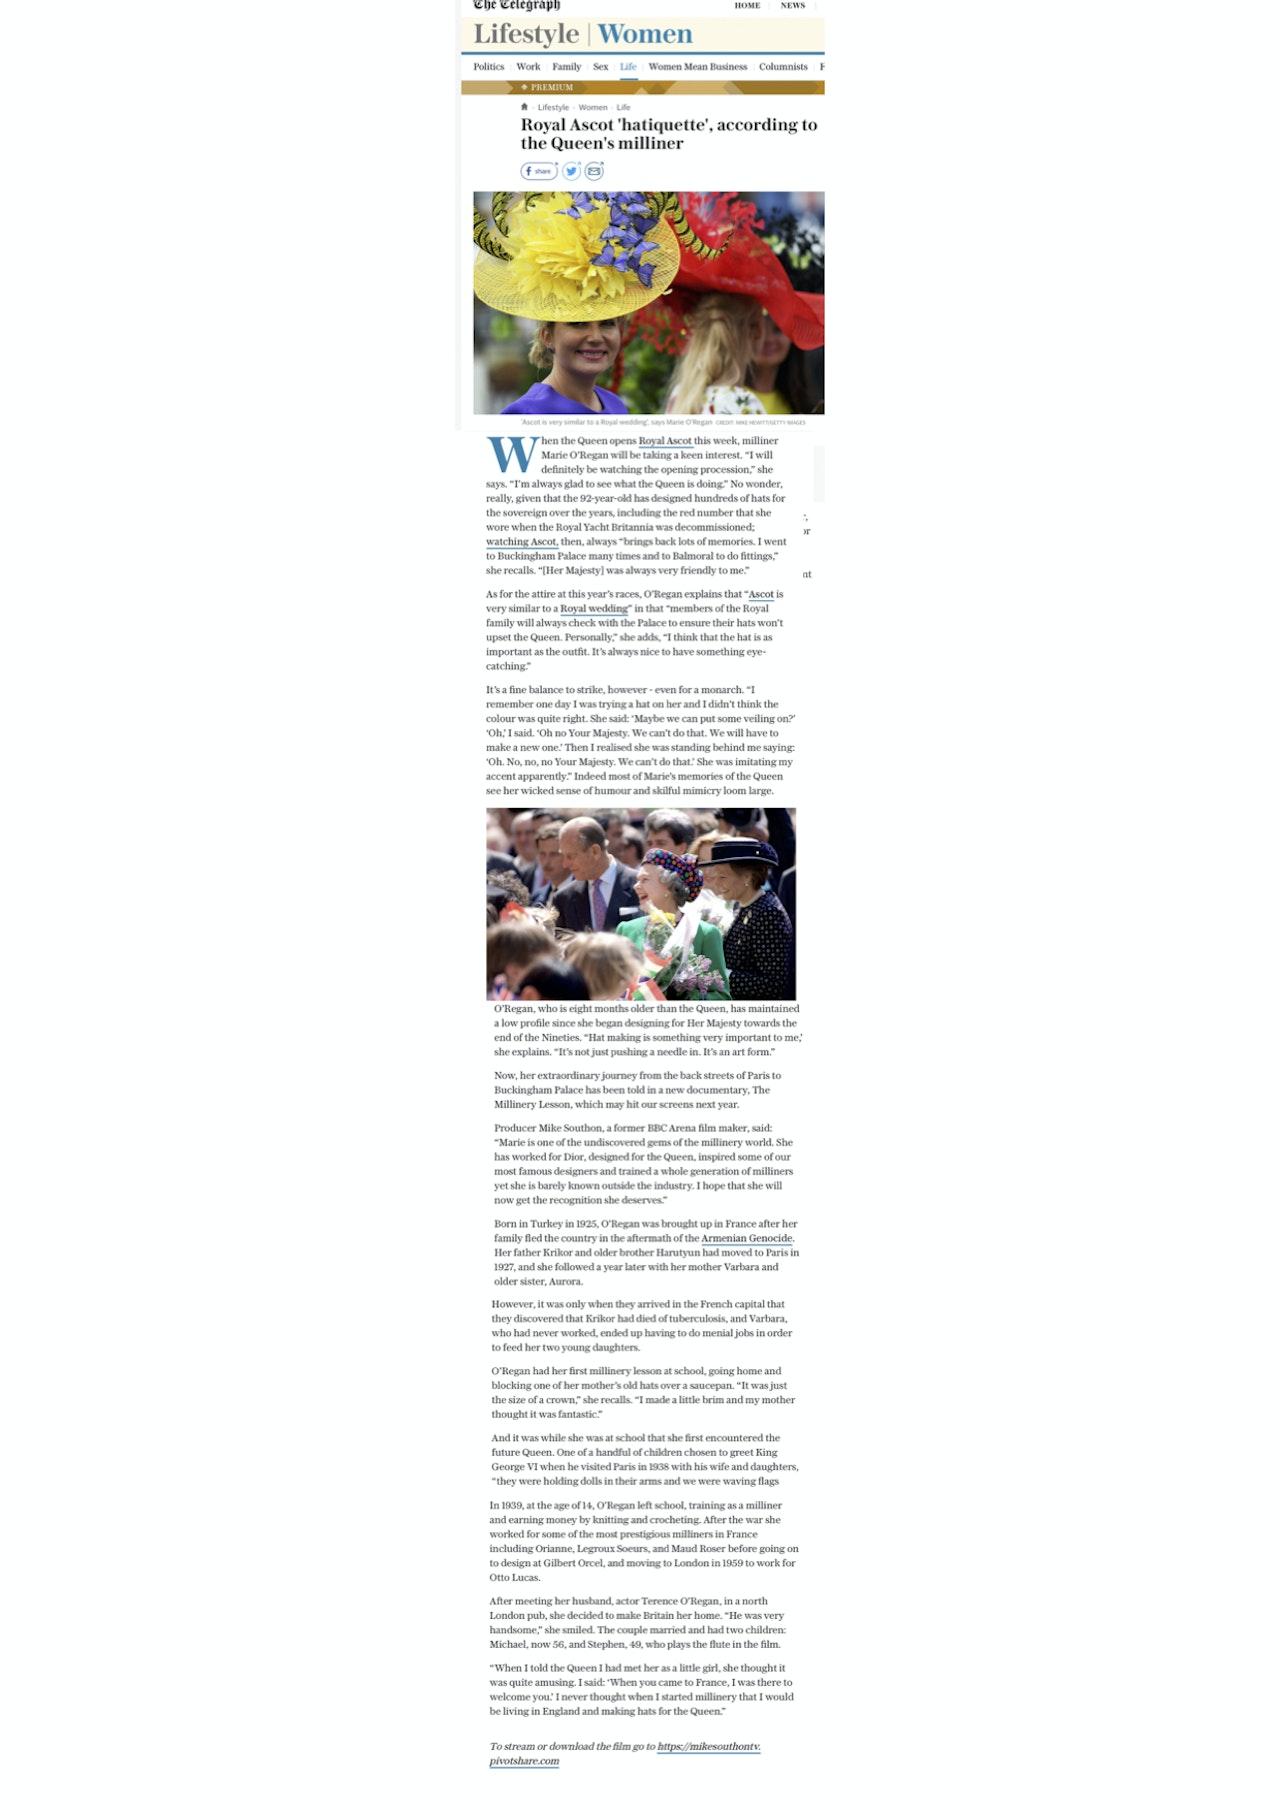 marie telegraph article